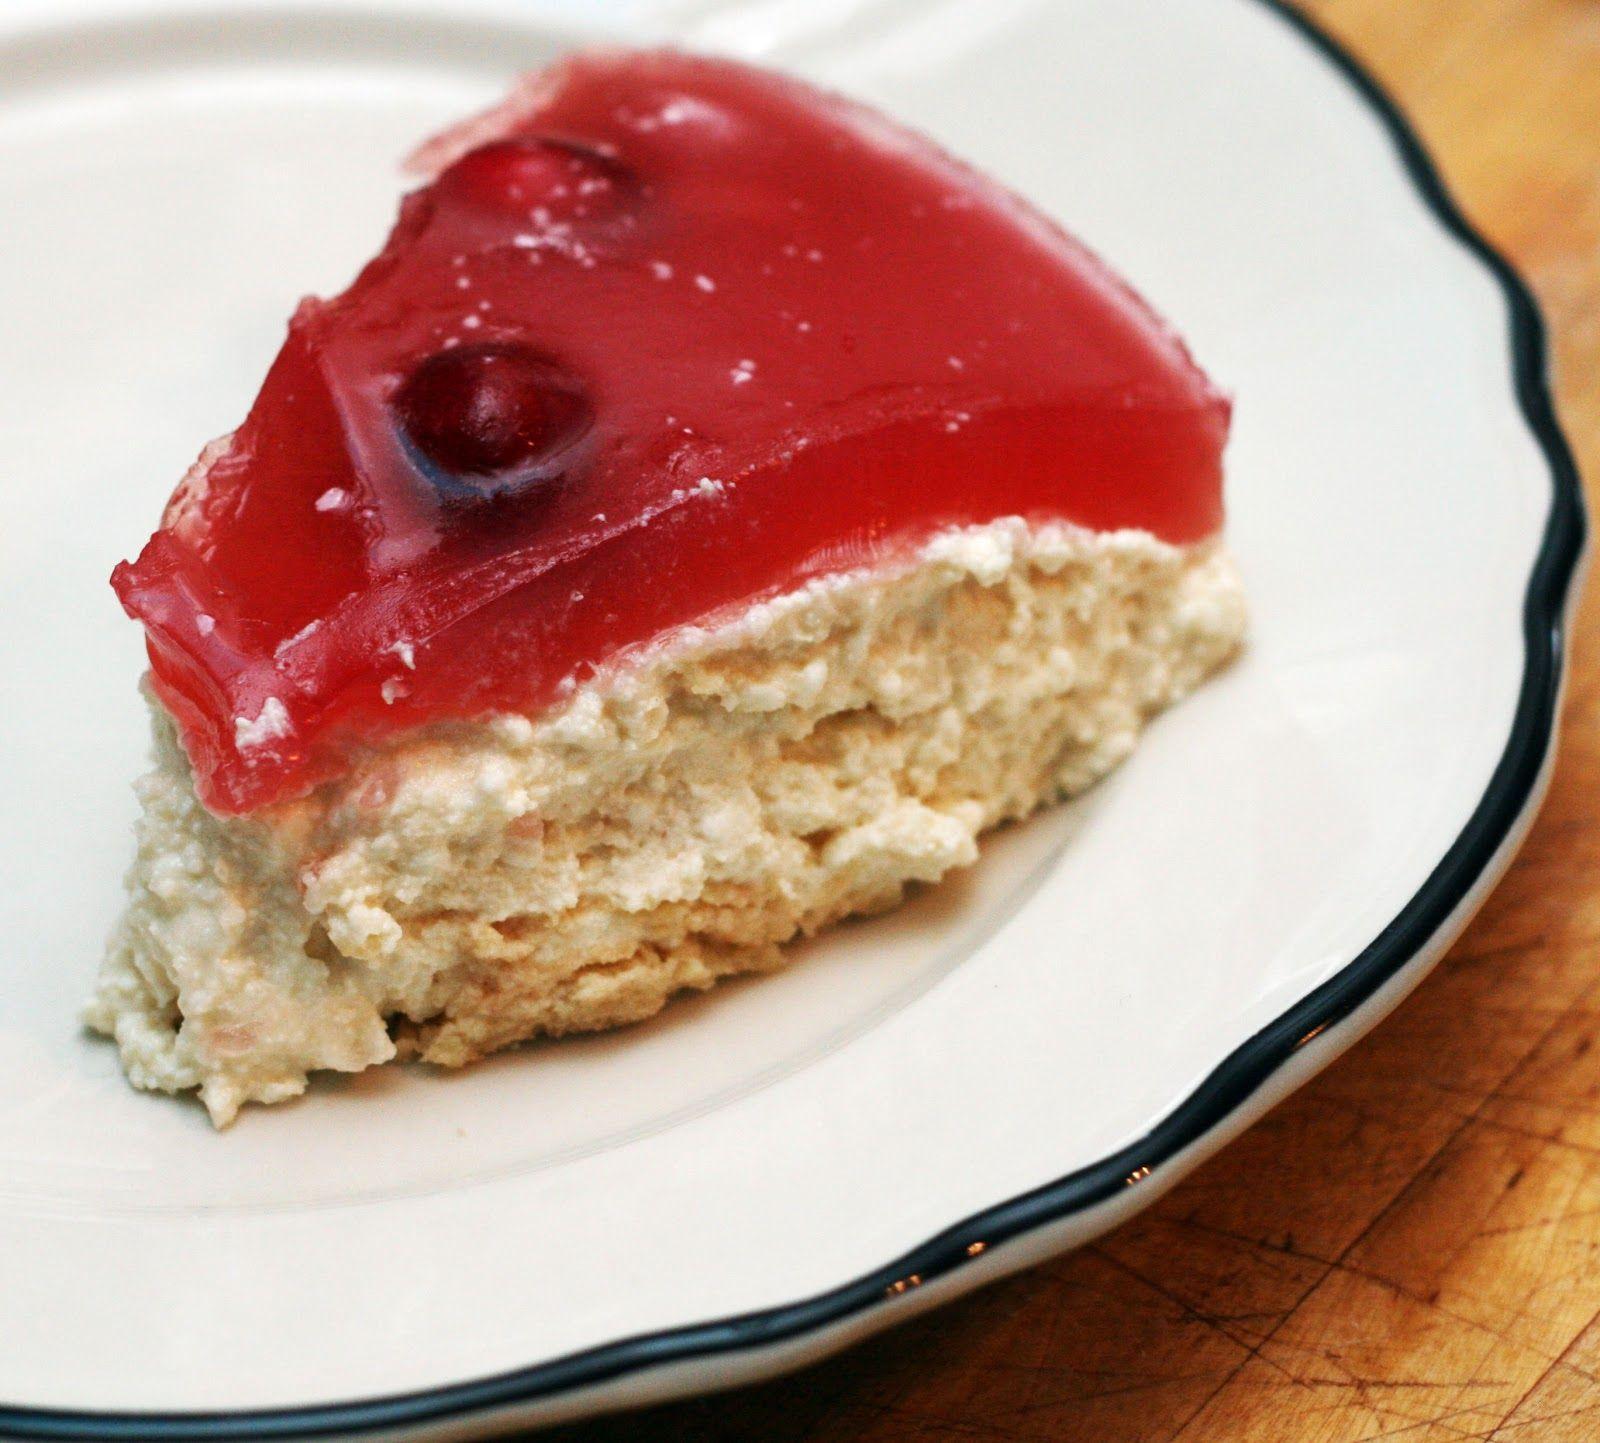 Sernik Na Zimno (Polish Cheesecake with Cranberry Topping)